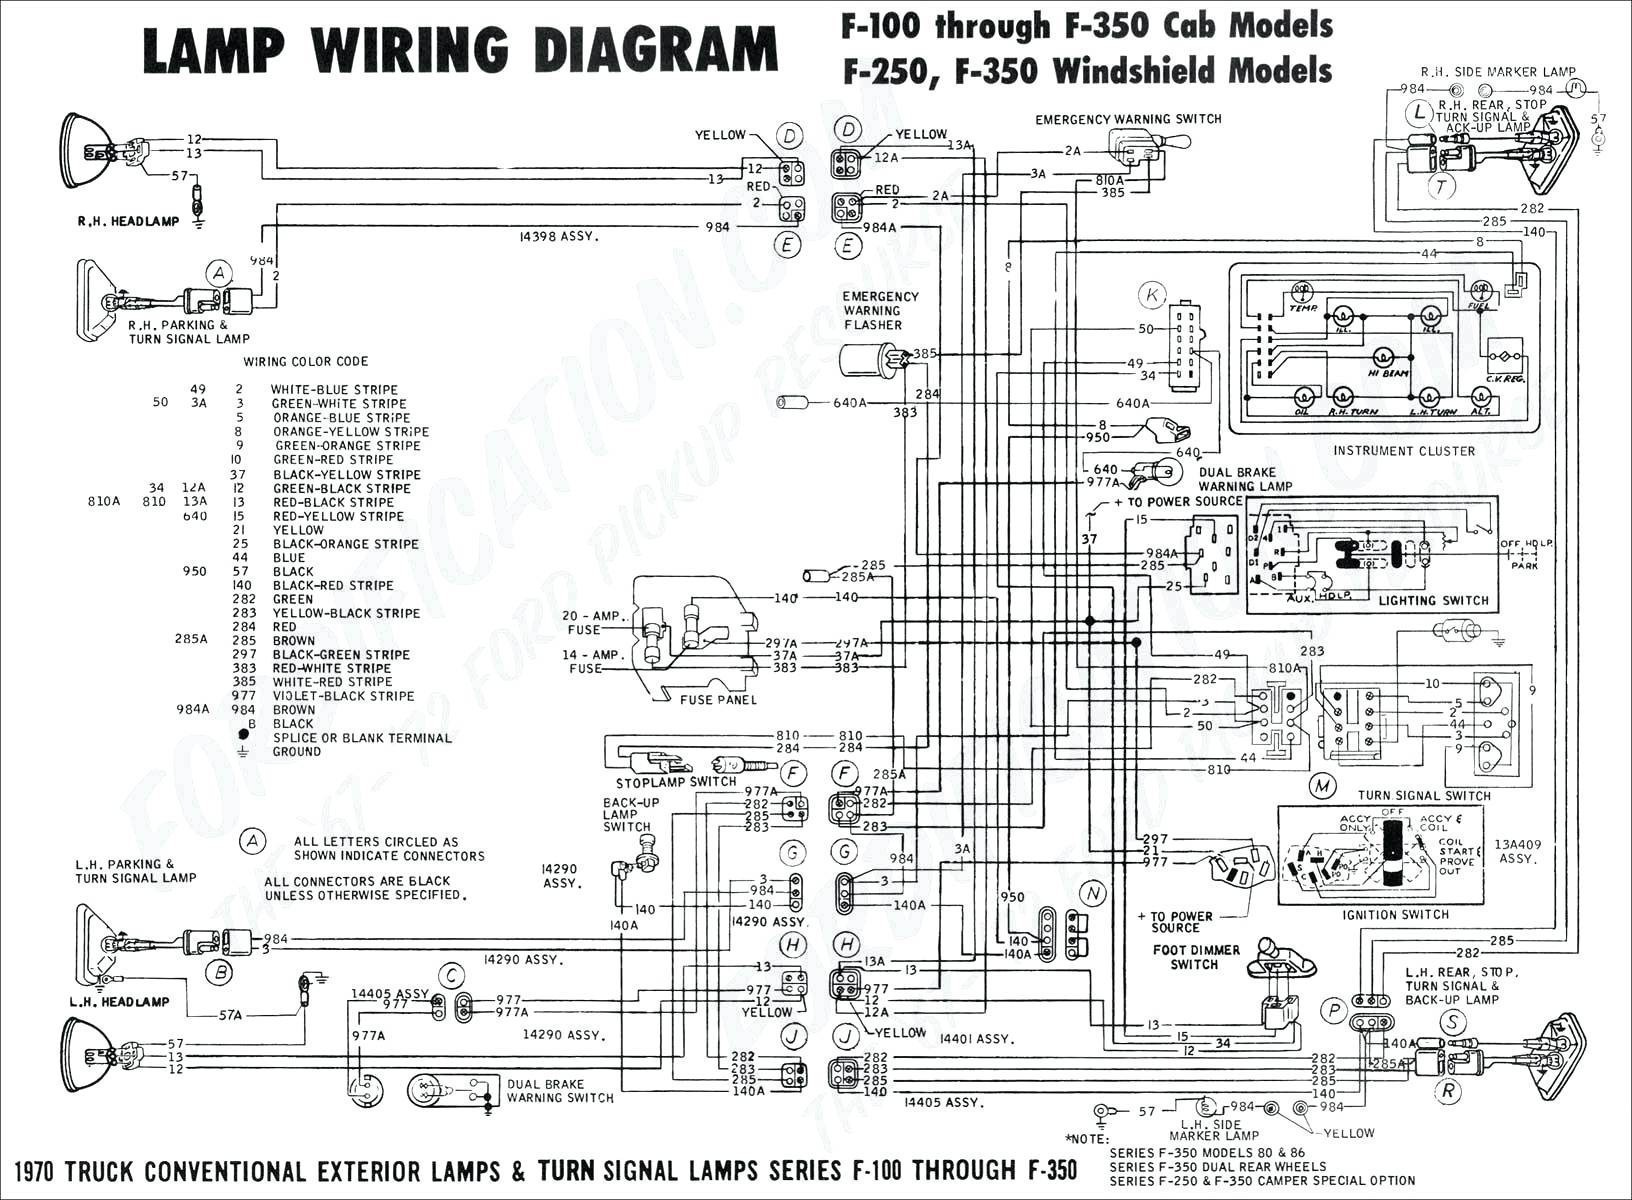 Dodge Ram 1500 Wiring Diagram Free Example 2006 Dodge Ram 1500 Parking Light Wiring Diagram Valid 99 Dodge Ram